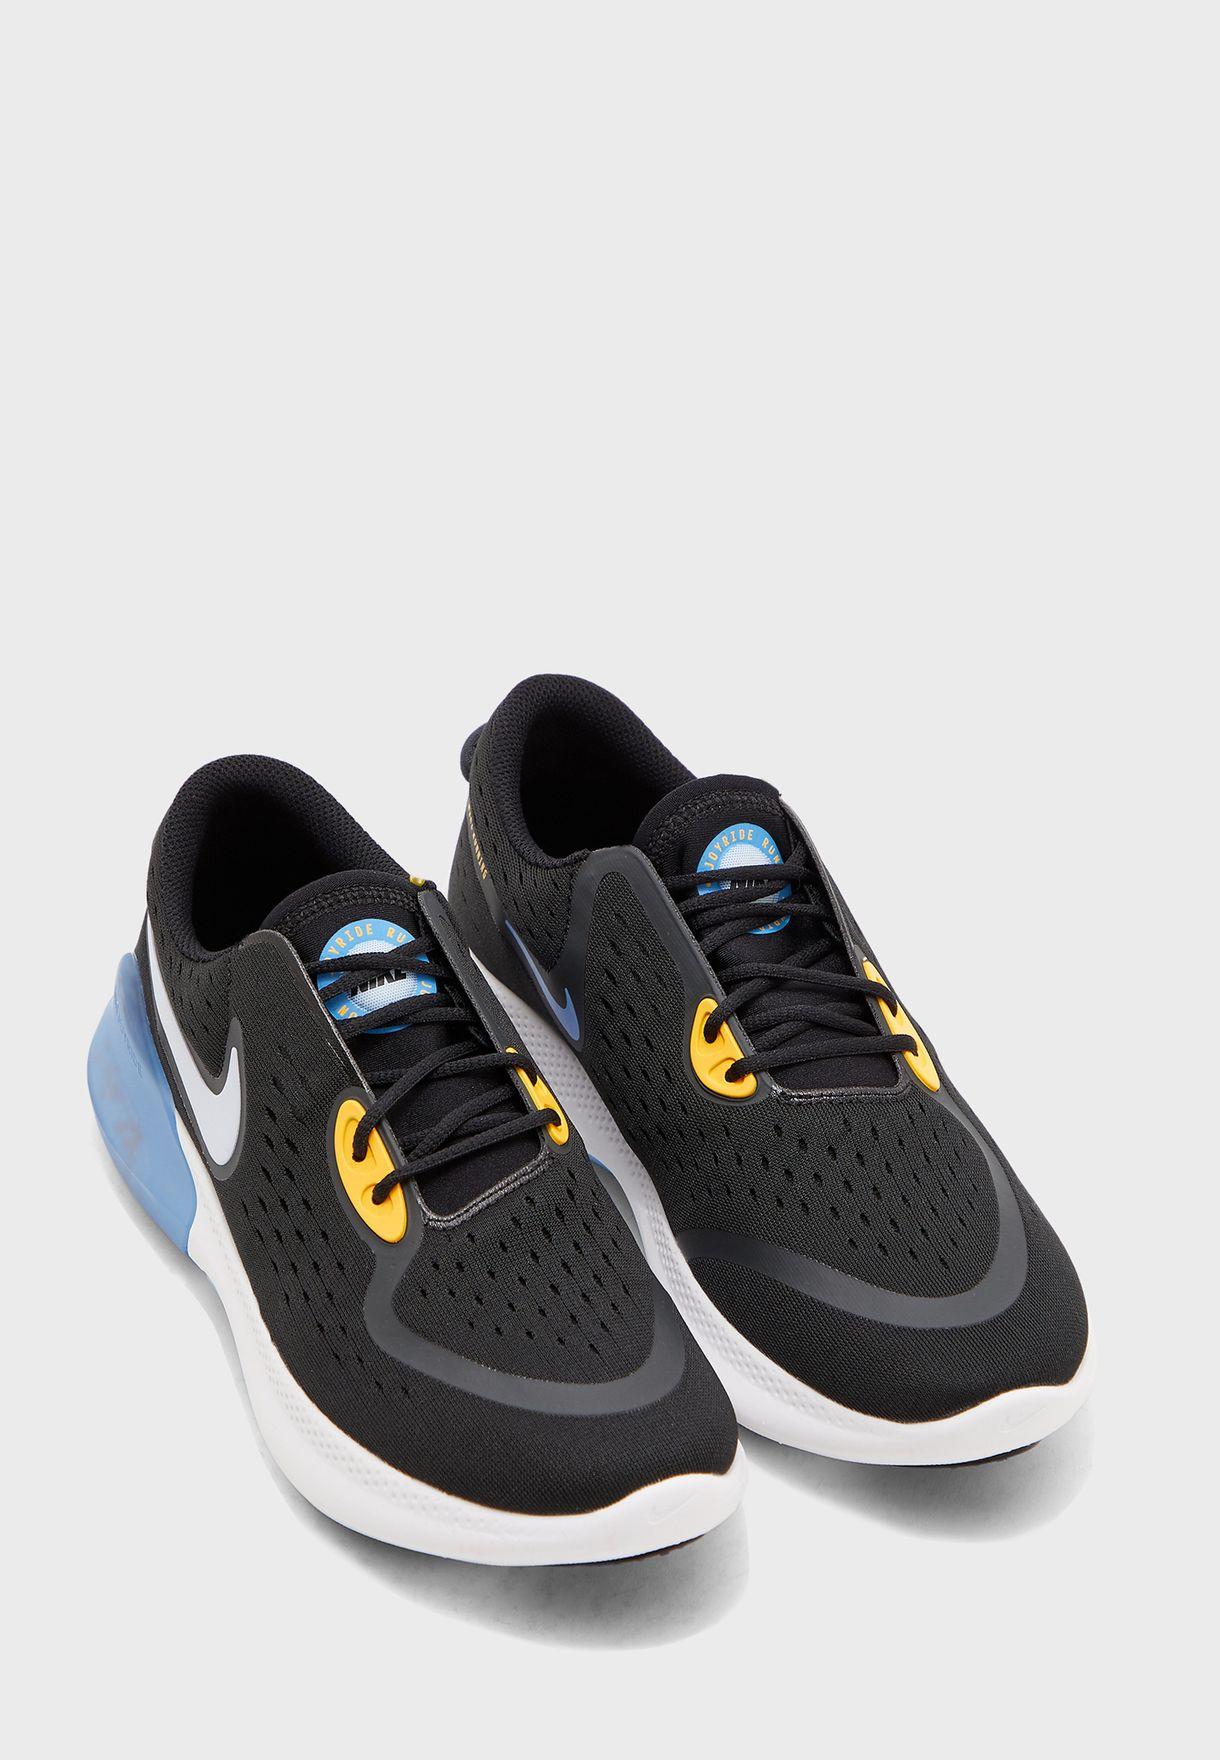 حذاء جوي رايد دوال رن